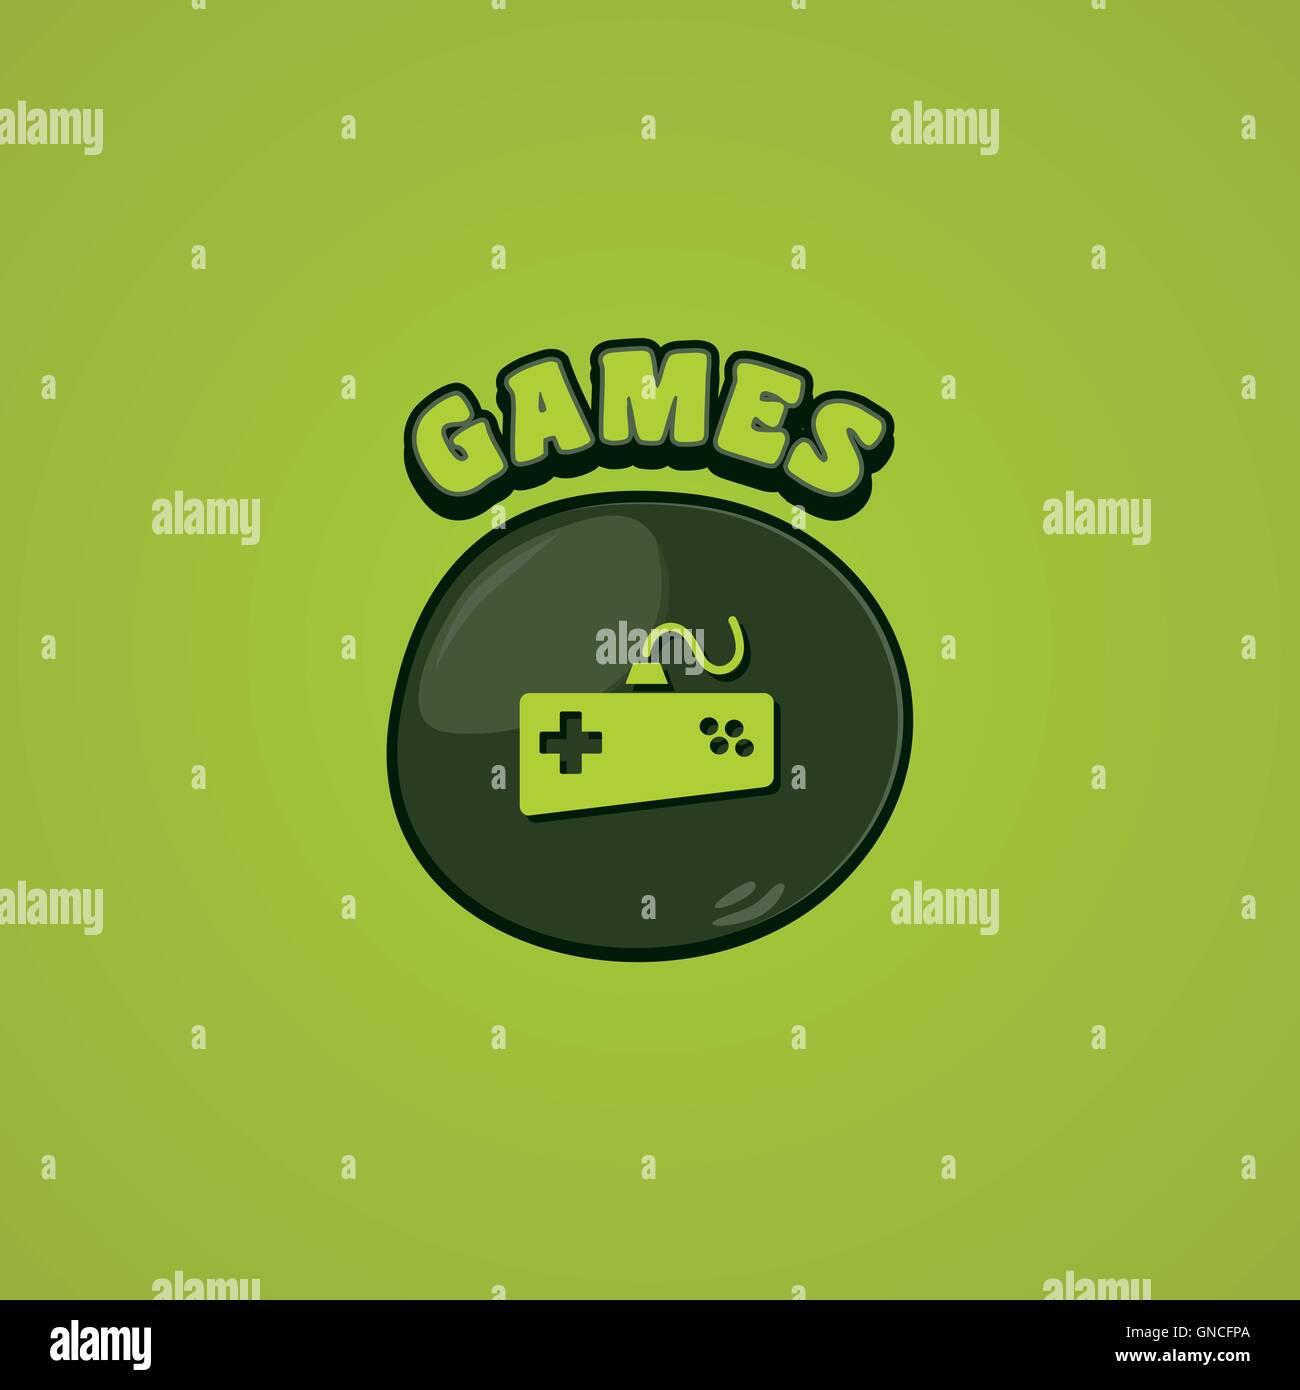 game console joystick - Stock Image